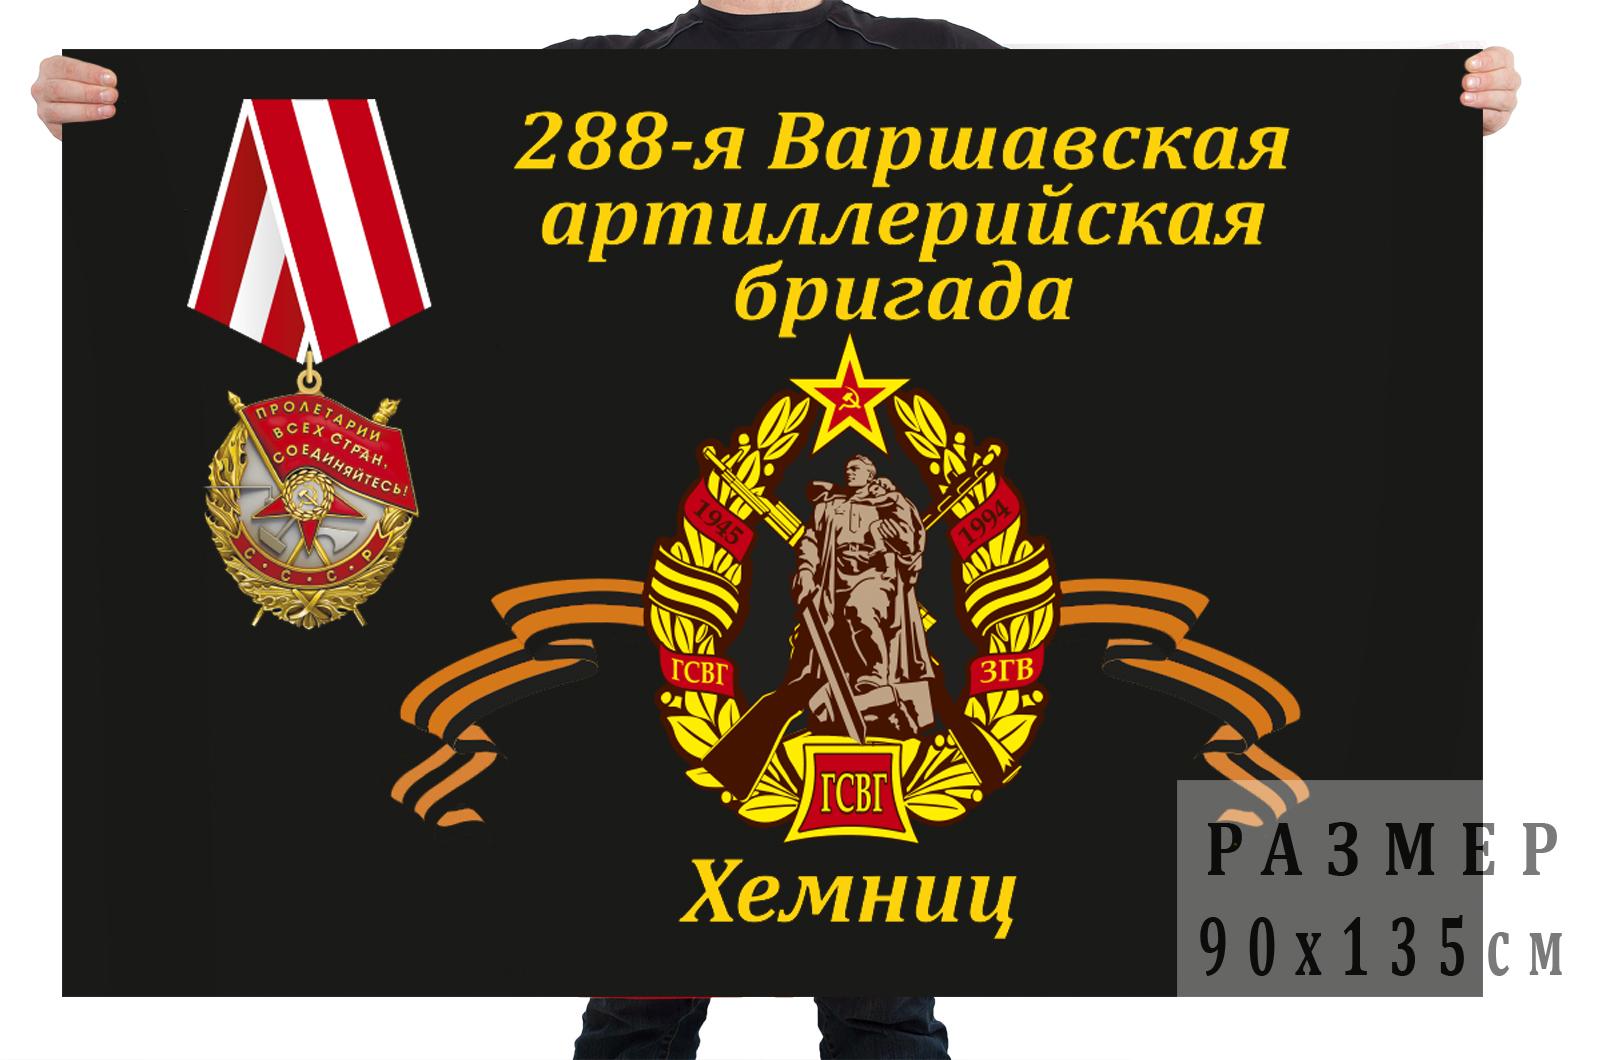 Флаг 288-я Варшавская артиллерийская бригада, Хемниц